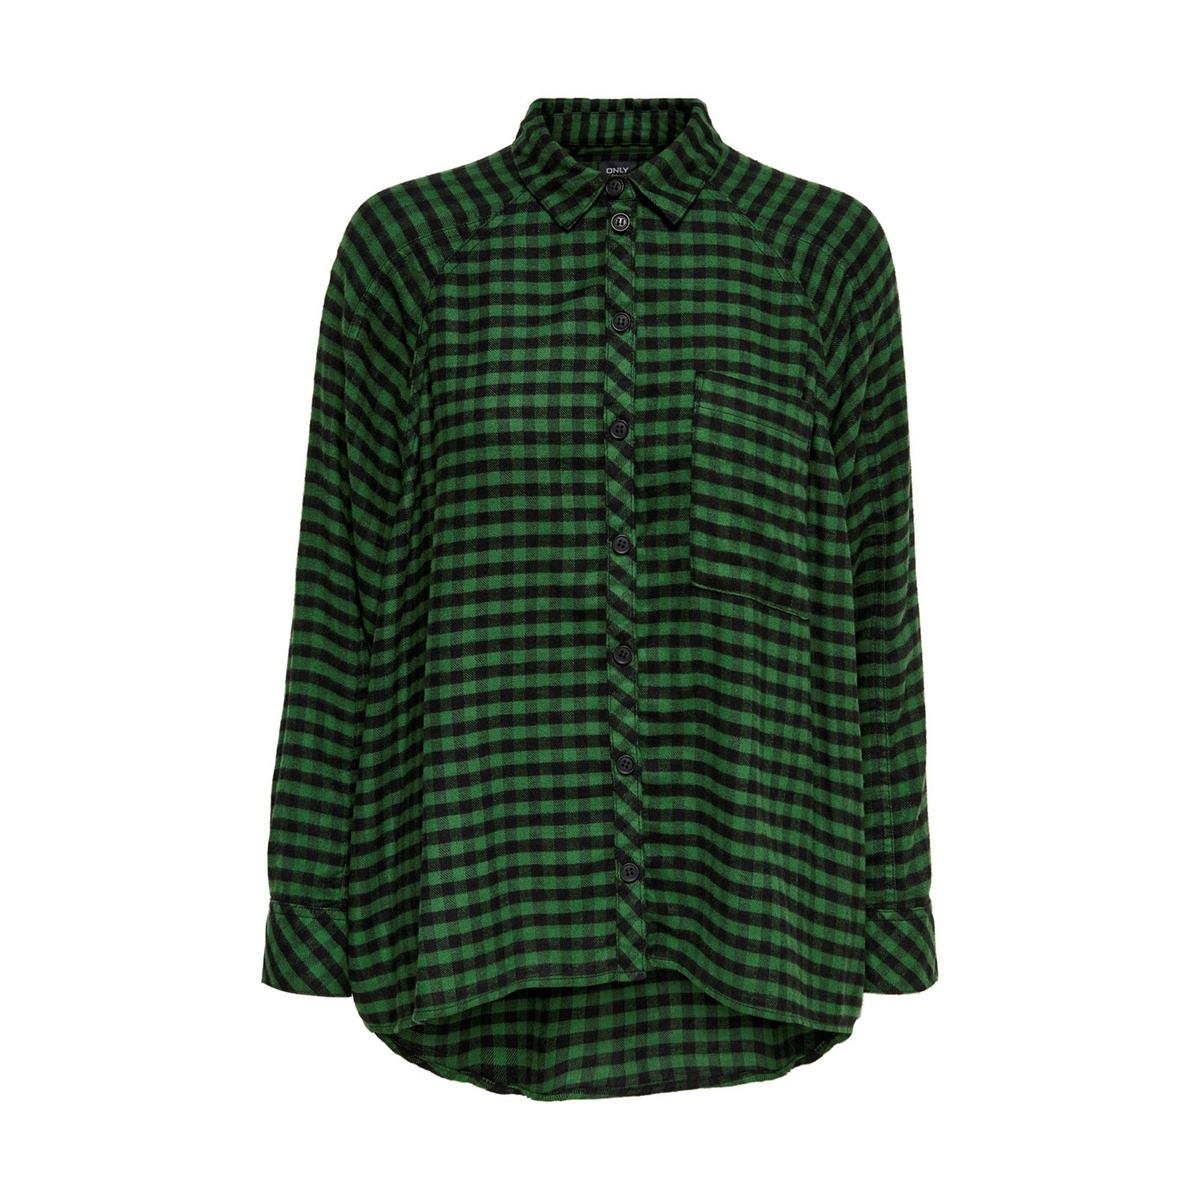 Camisa de mangas compridas, bolso no peito